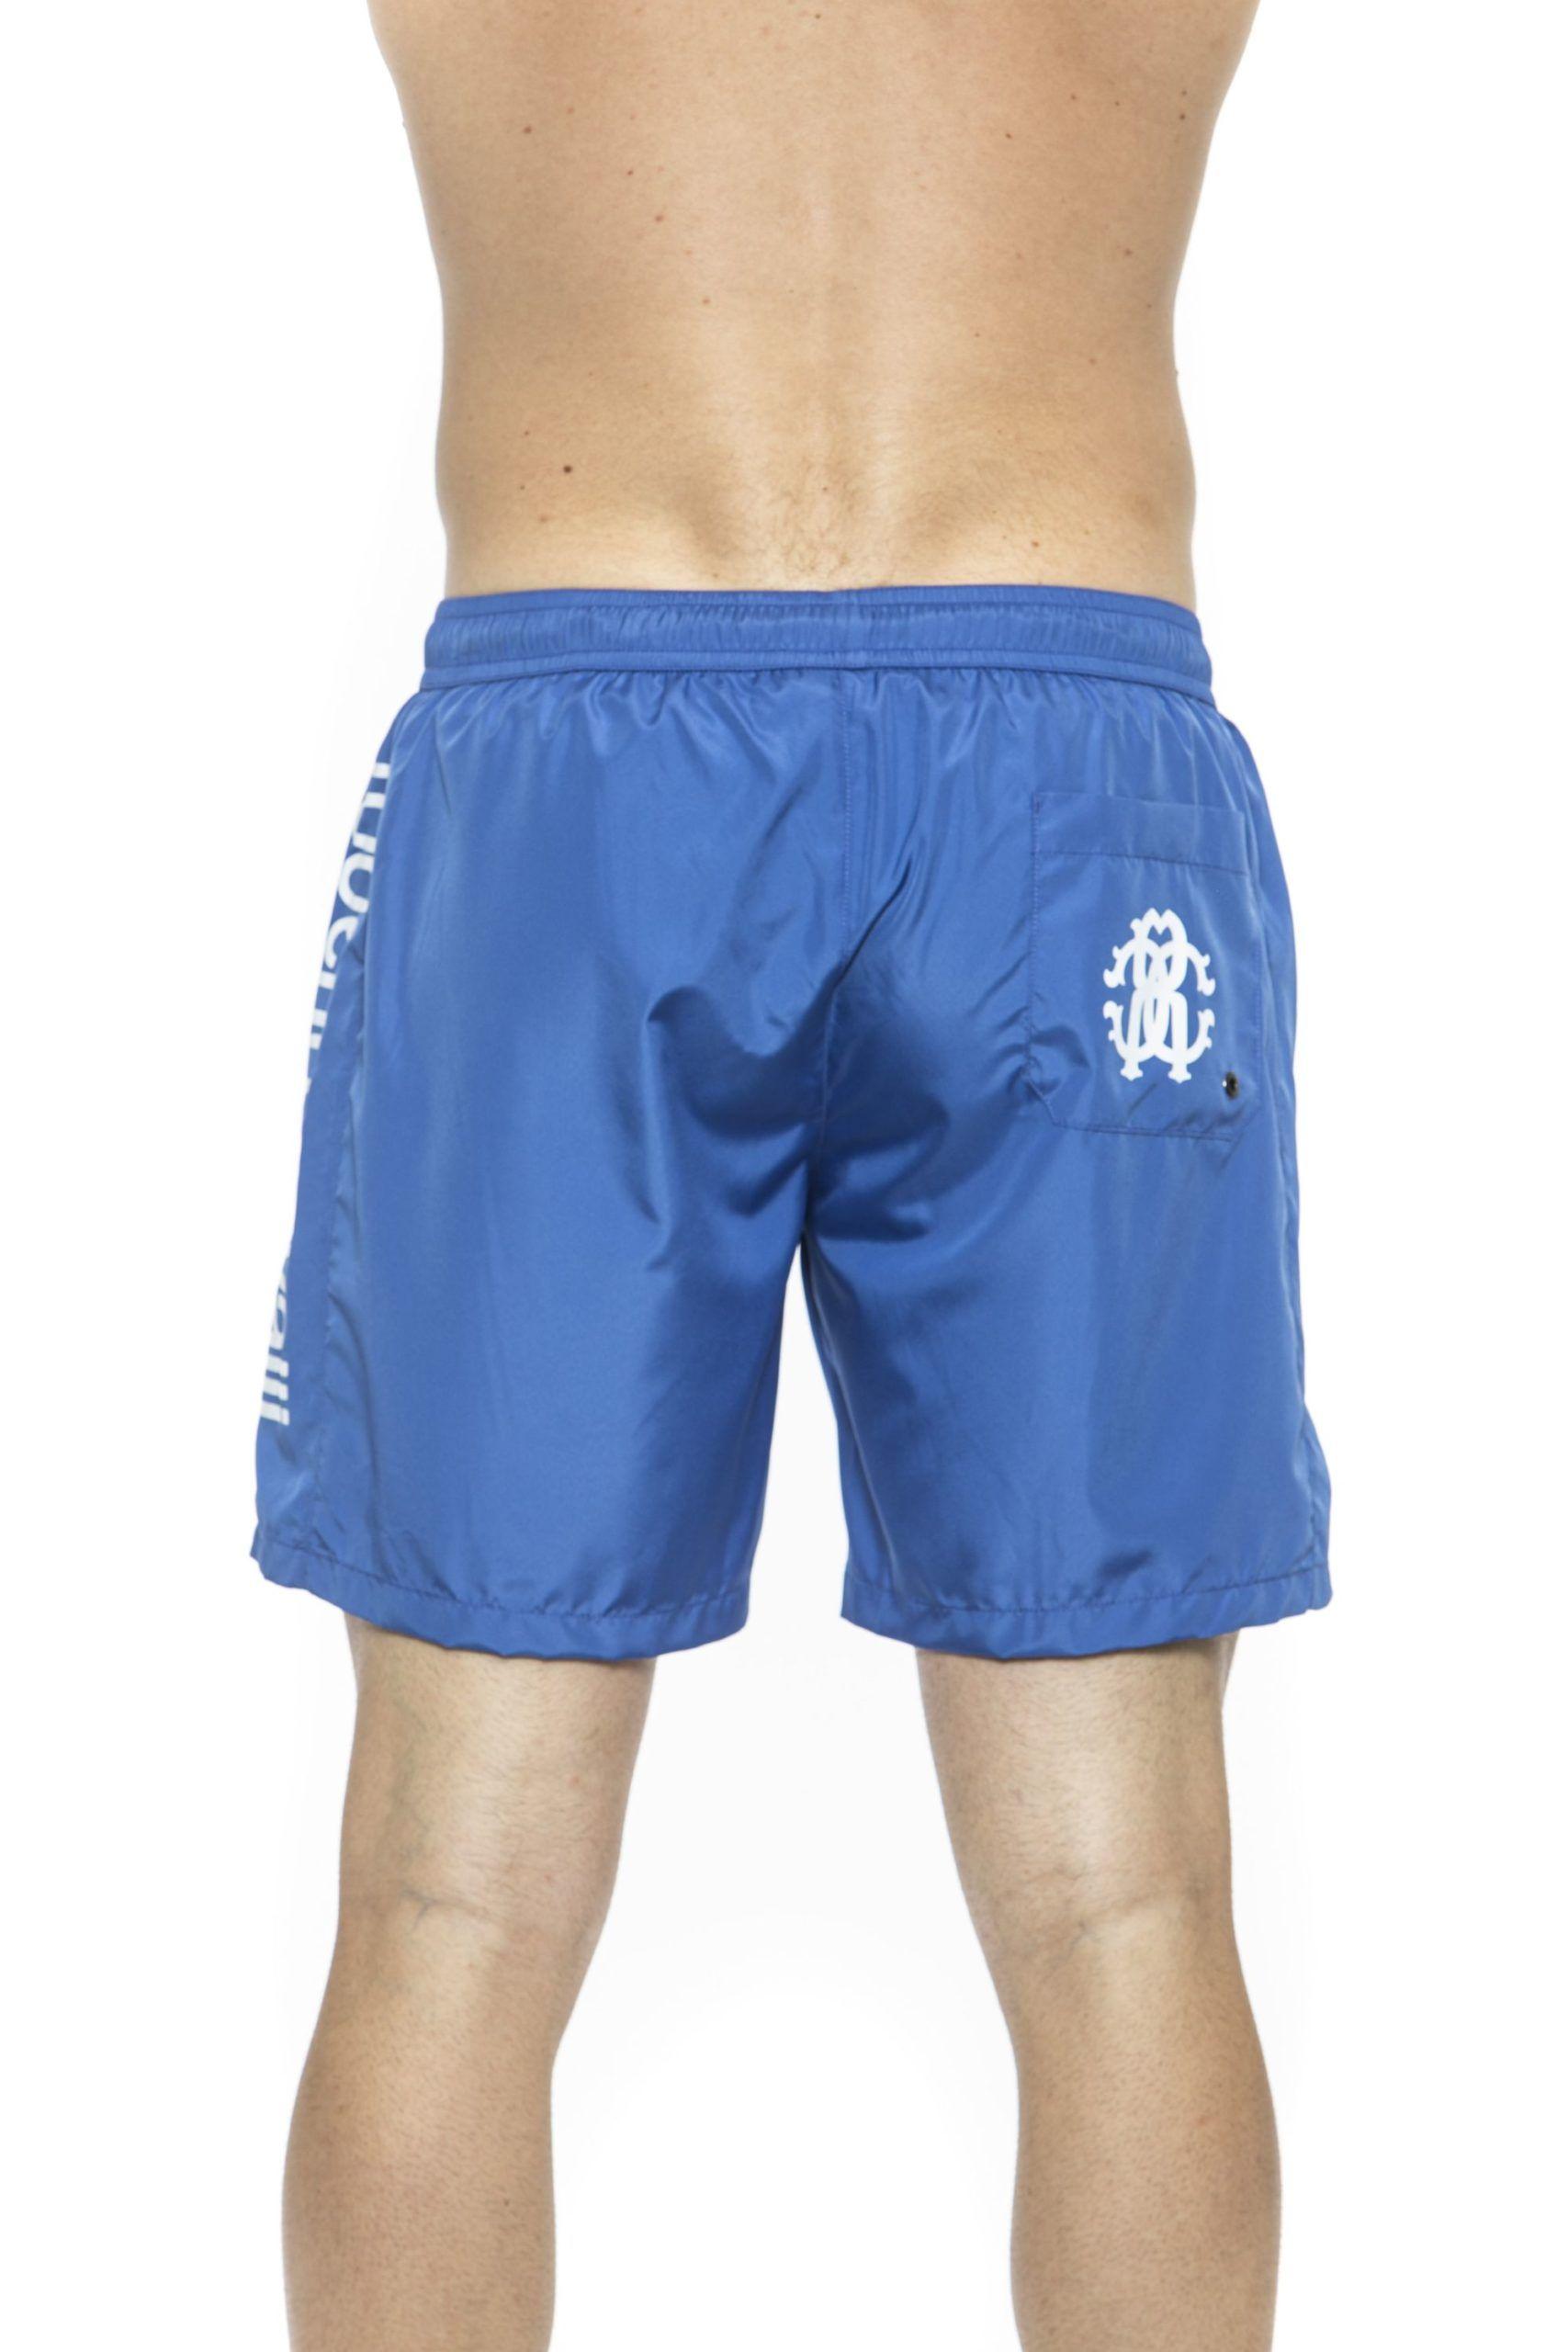 Roberto Cavalli Beachwear Blue Beachwear Boxer With Pockets. Side Logo Print. Internal Net. Back Pocket